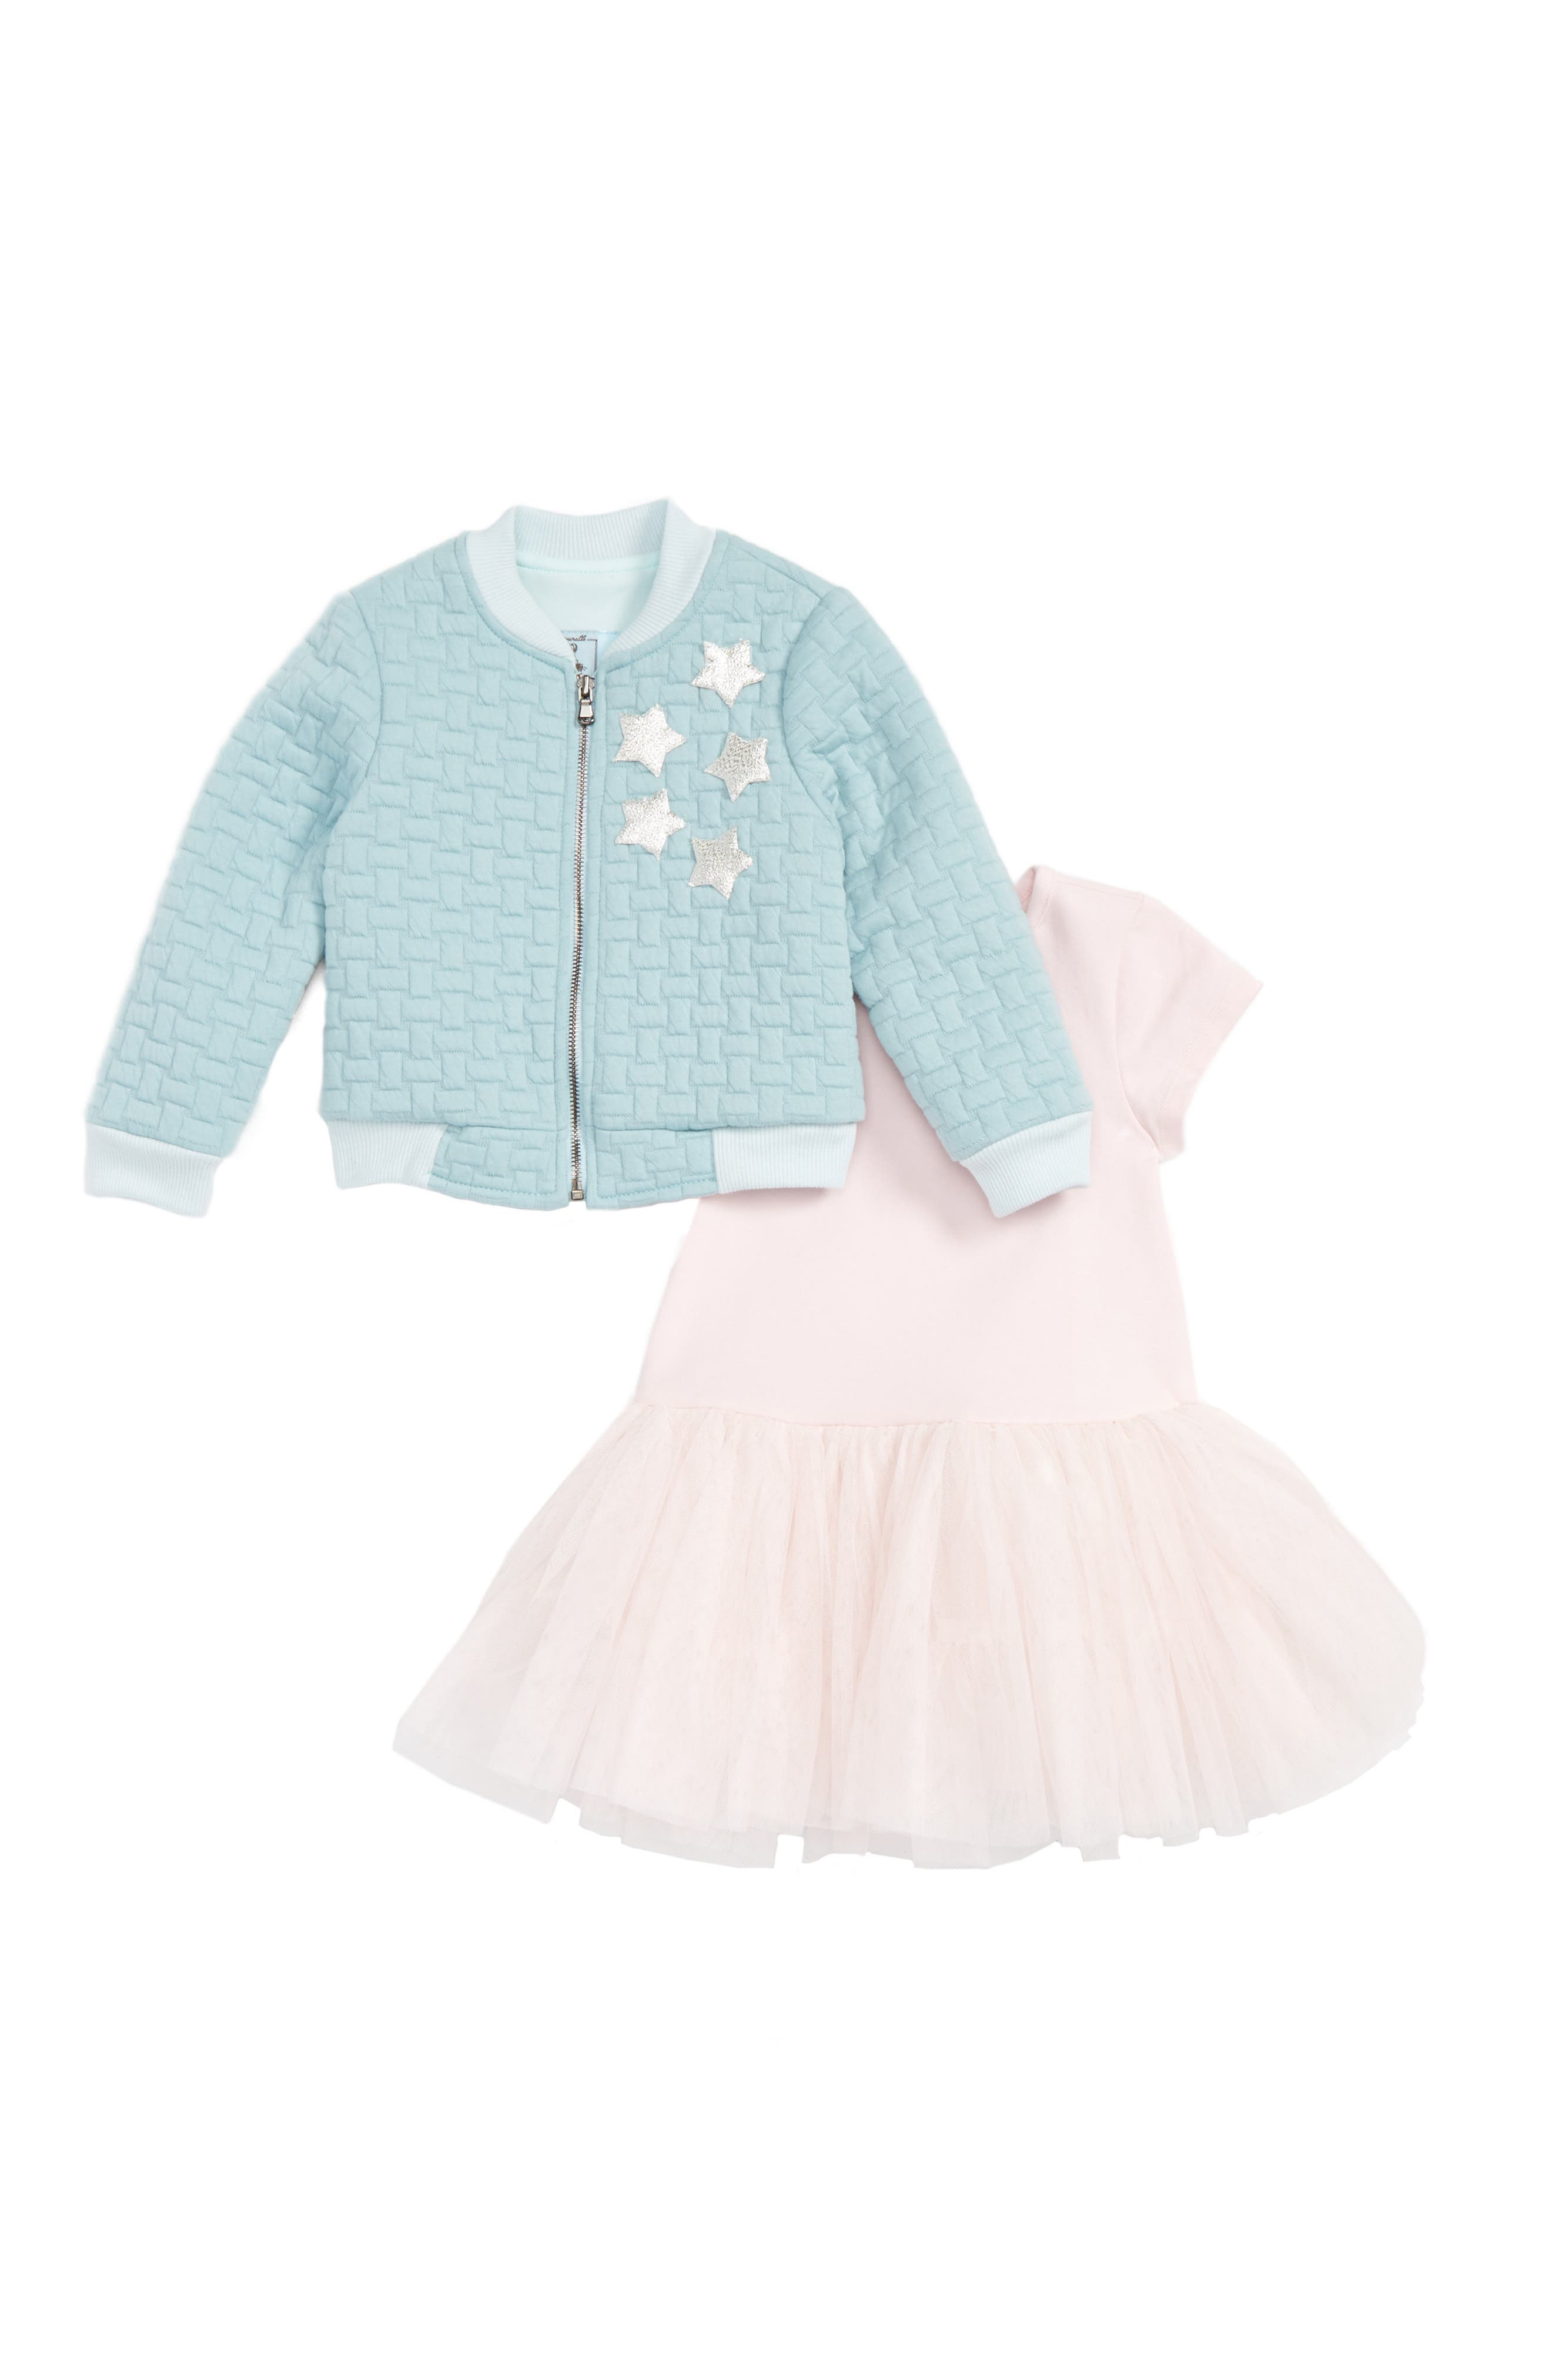 Main Image - Pippa & Julie Bomber Jacket & Tulle Dress Set (Toddler Girls & Little Girls)